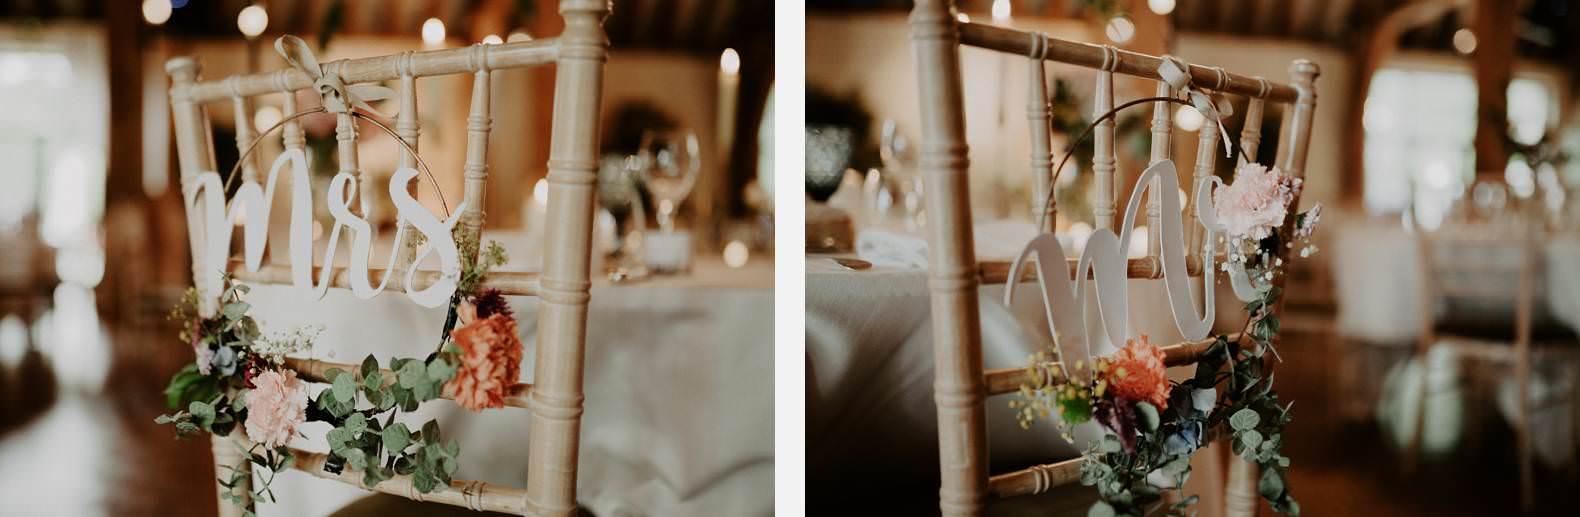 mariage manoir de corny photographe bel esprit 0042 1